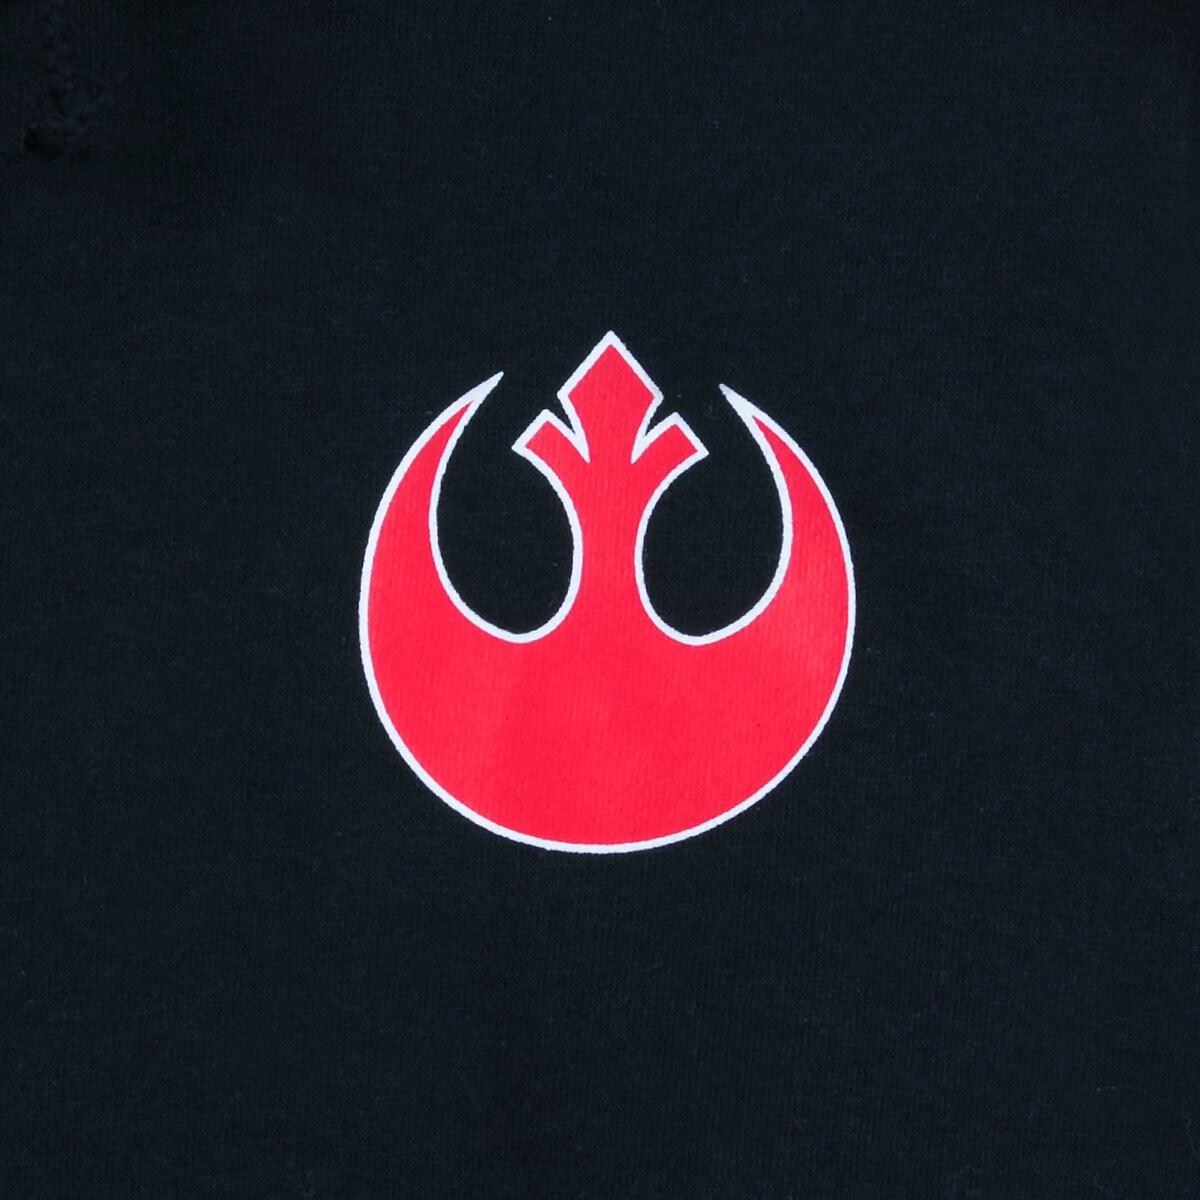 a1d4093f216 Star Wars Rebel Alliance Hooded Dress for Women